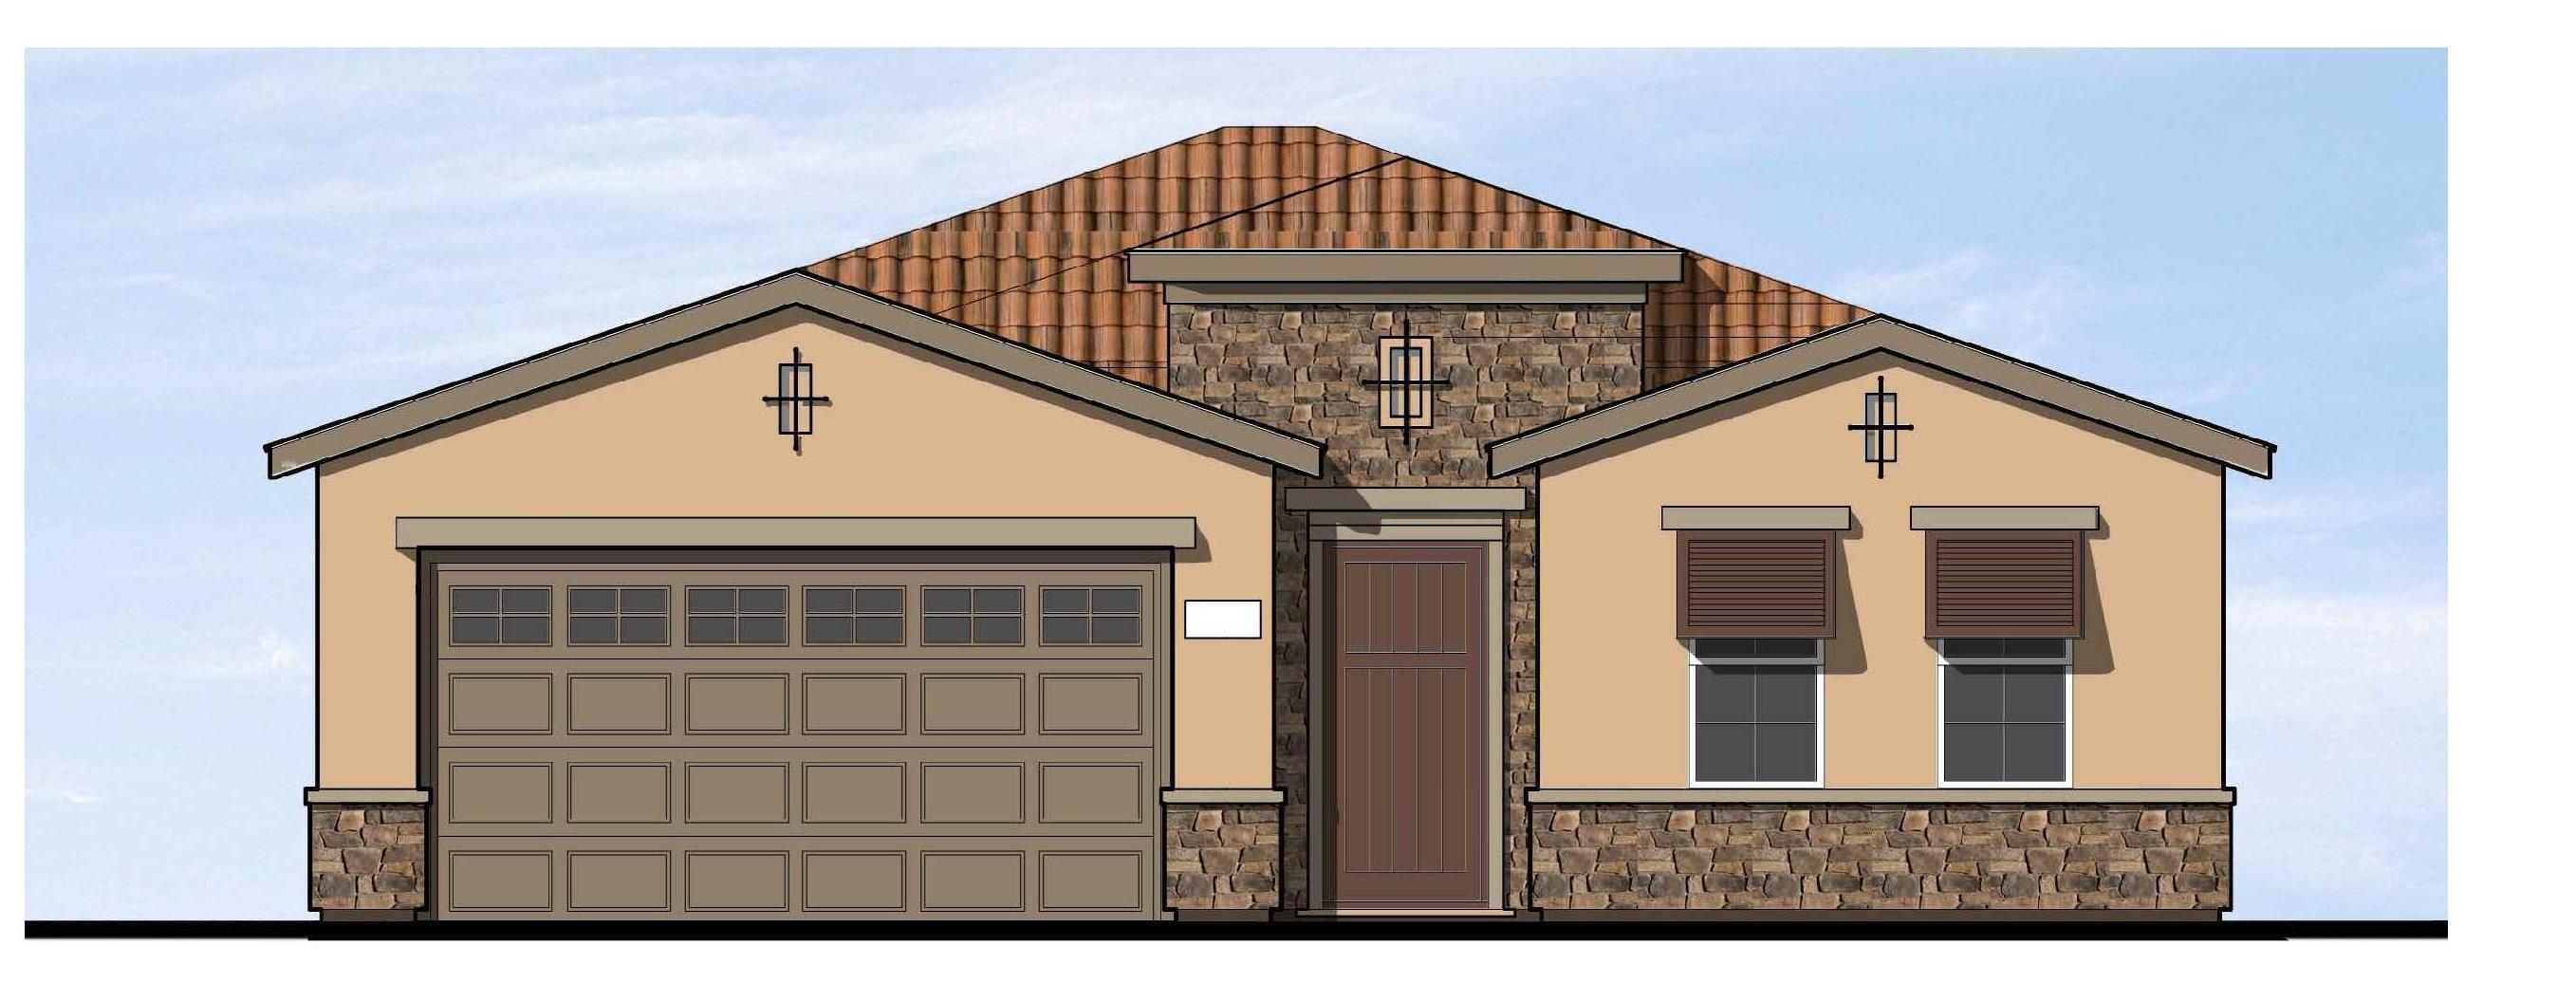 4505 Via Veneto, Palm Desert, California 92260, 3 Bedrooms Bedrooms, ,4 BathroomsBathrooms,Residential,For Sale,4505 Via Veneto,219041511